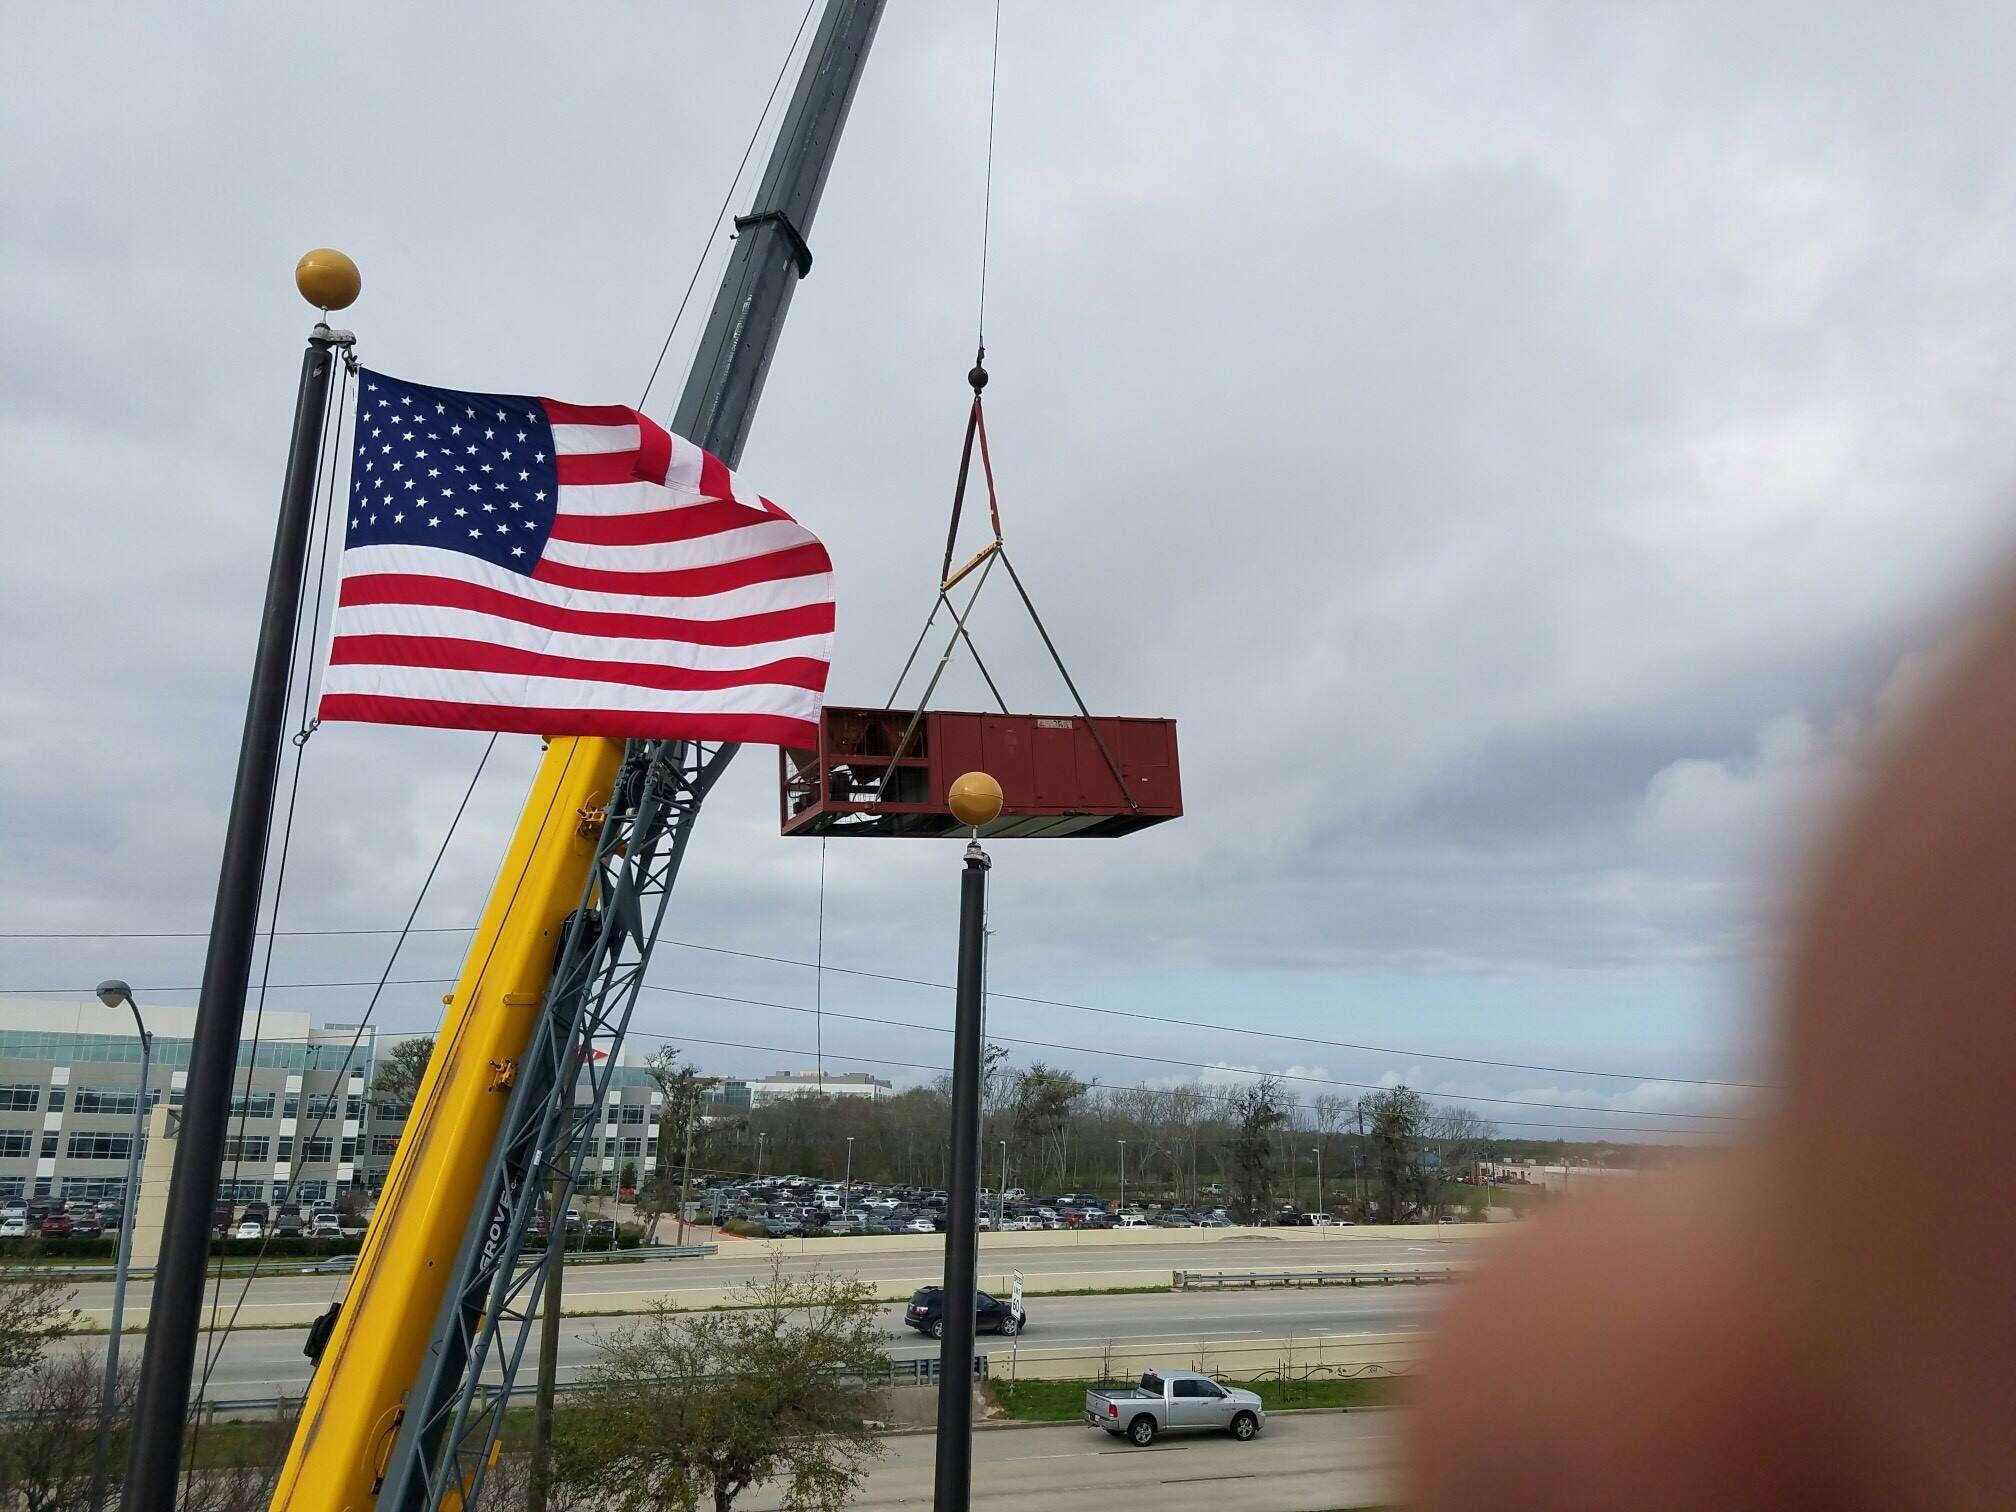 City Install Clute, Brazoria County, Houston